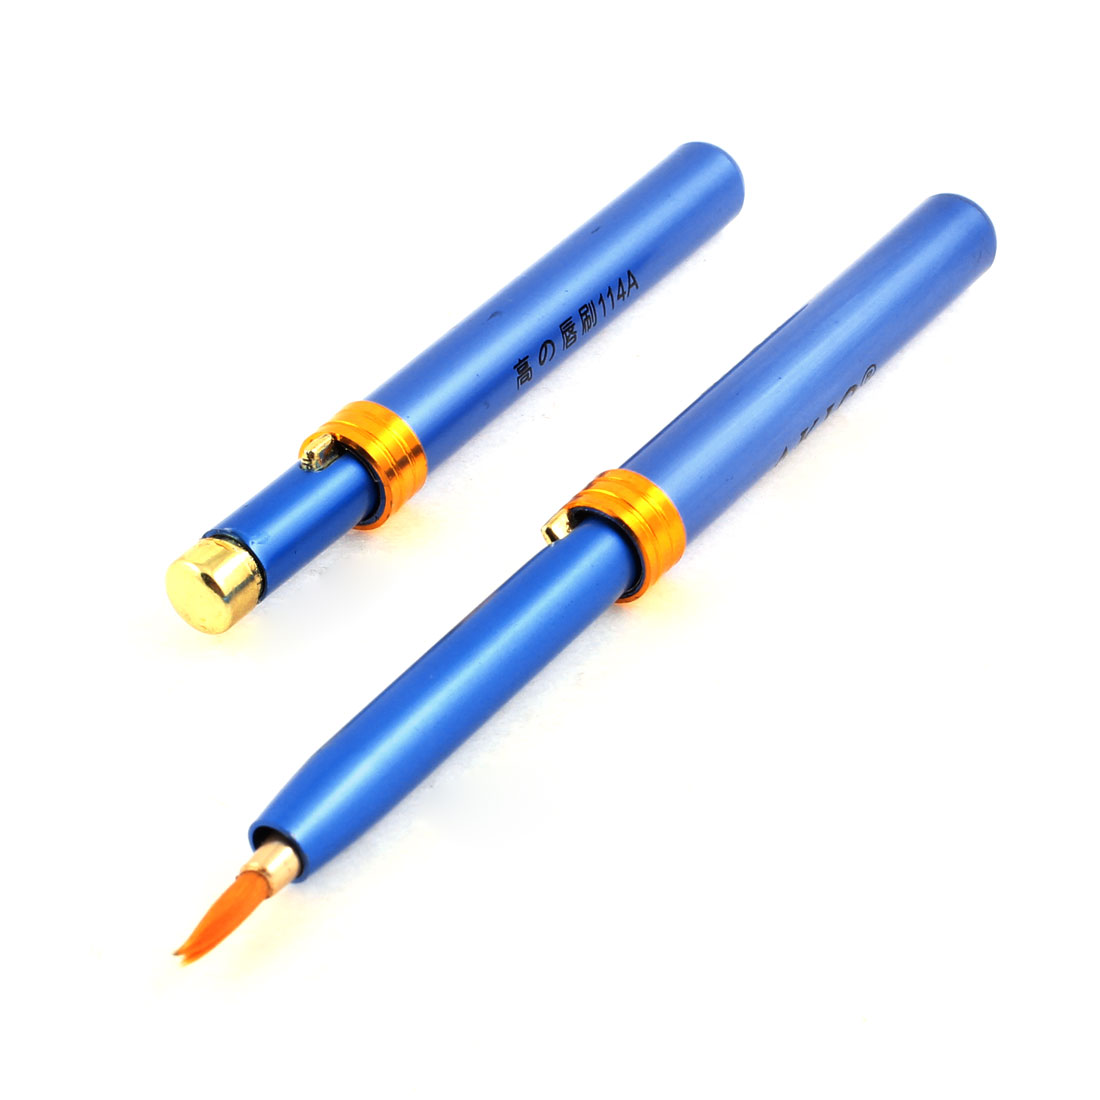 2 Pcs Blue Gold Tone Alloy Retractable Handle Cosmetic Lip Brush